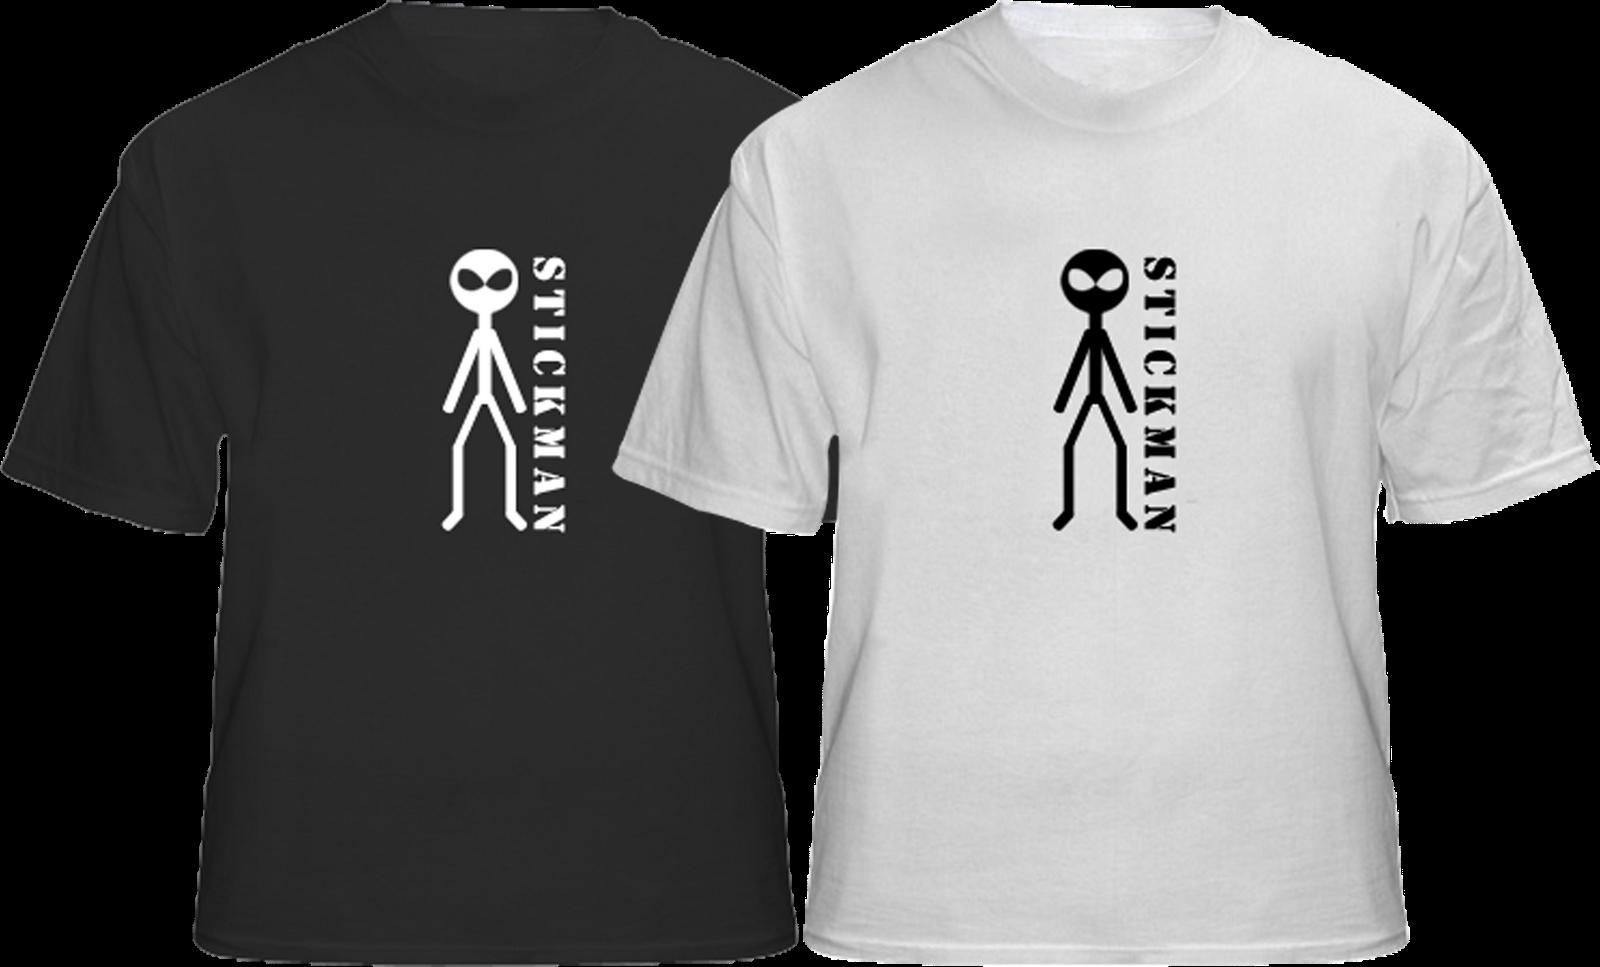 Stickman T Shirt Design Tendencies Tshirt My Hitam S